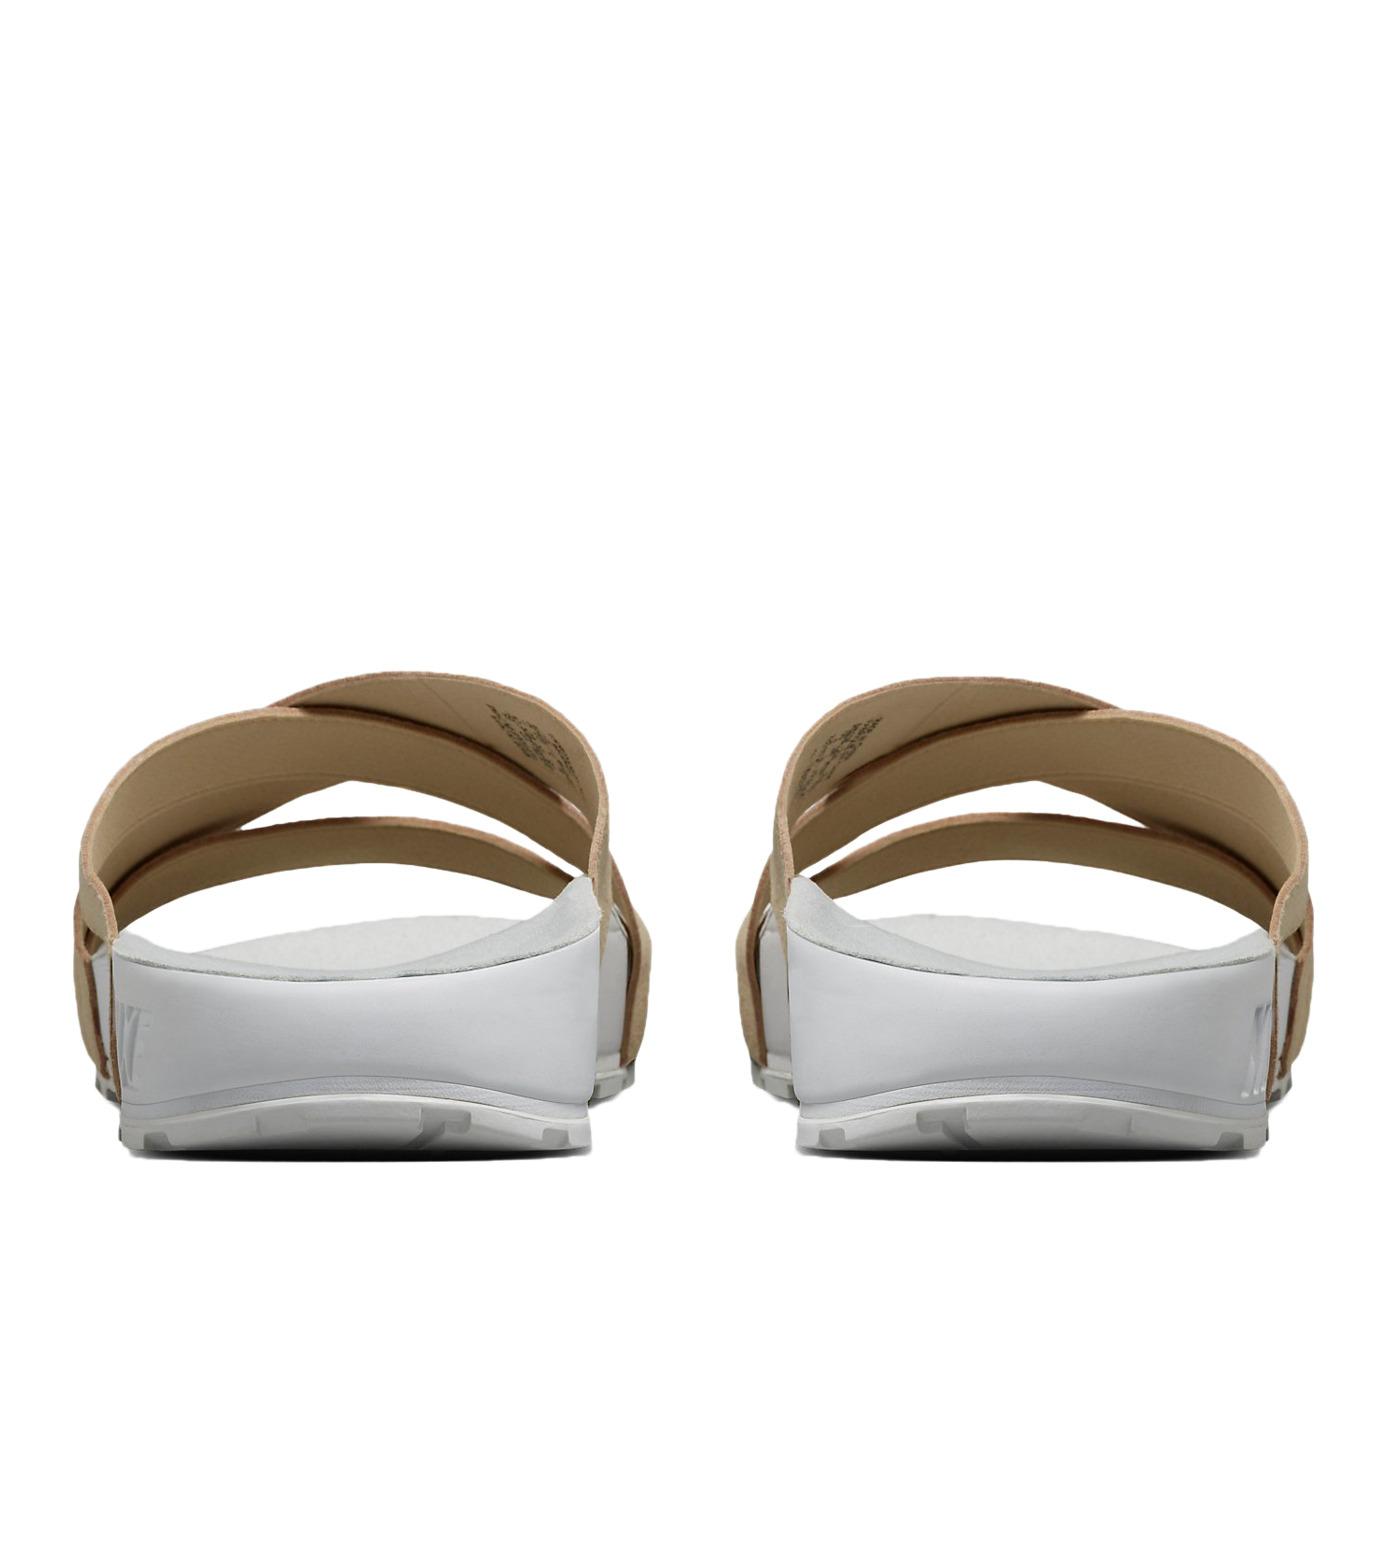 NIKE(ナイキ)のTAUPO-BEIGE(シューズ/shoes)-849756-210-52 拡大詳細画像5